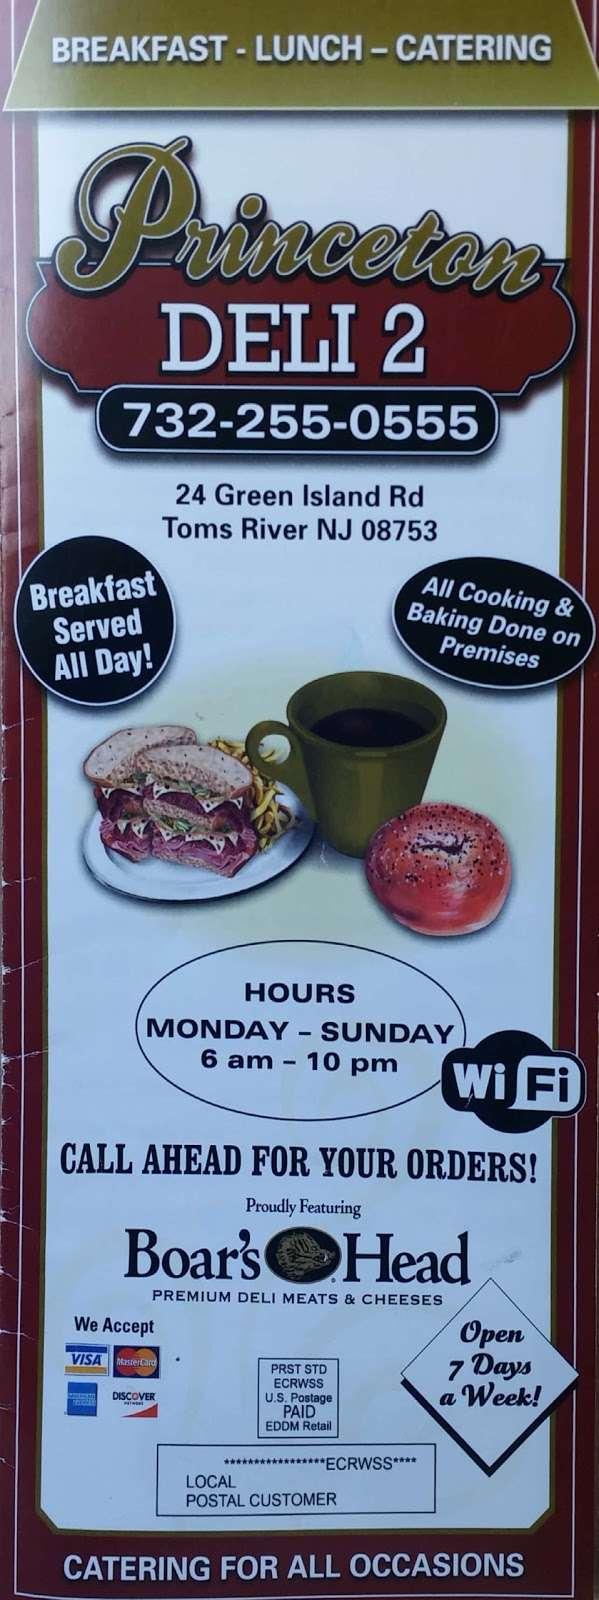 Princeton Deli 2 - convenience store  | Photo 2 of 5 | Address: 24 Green Island Rd, Toms River, NJ 08753, USA | Phone: (732) 255-0555